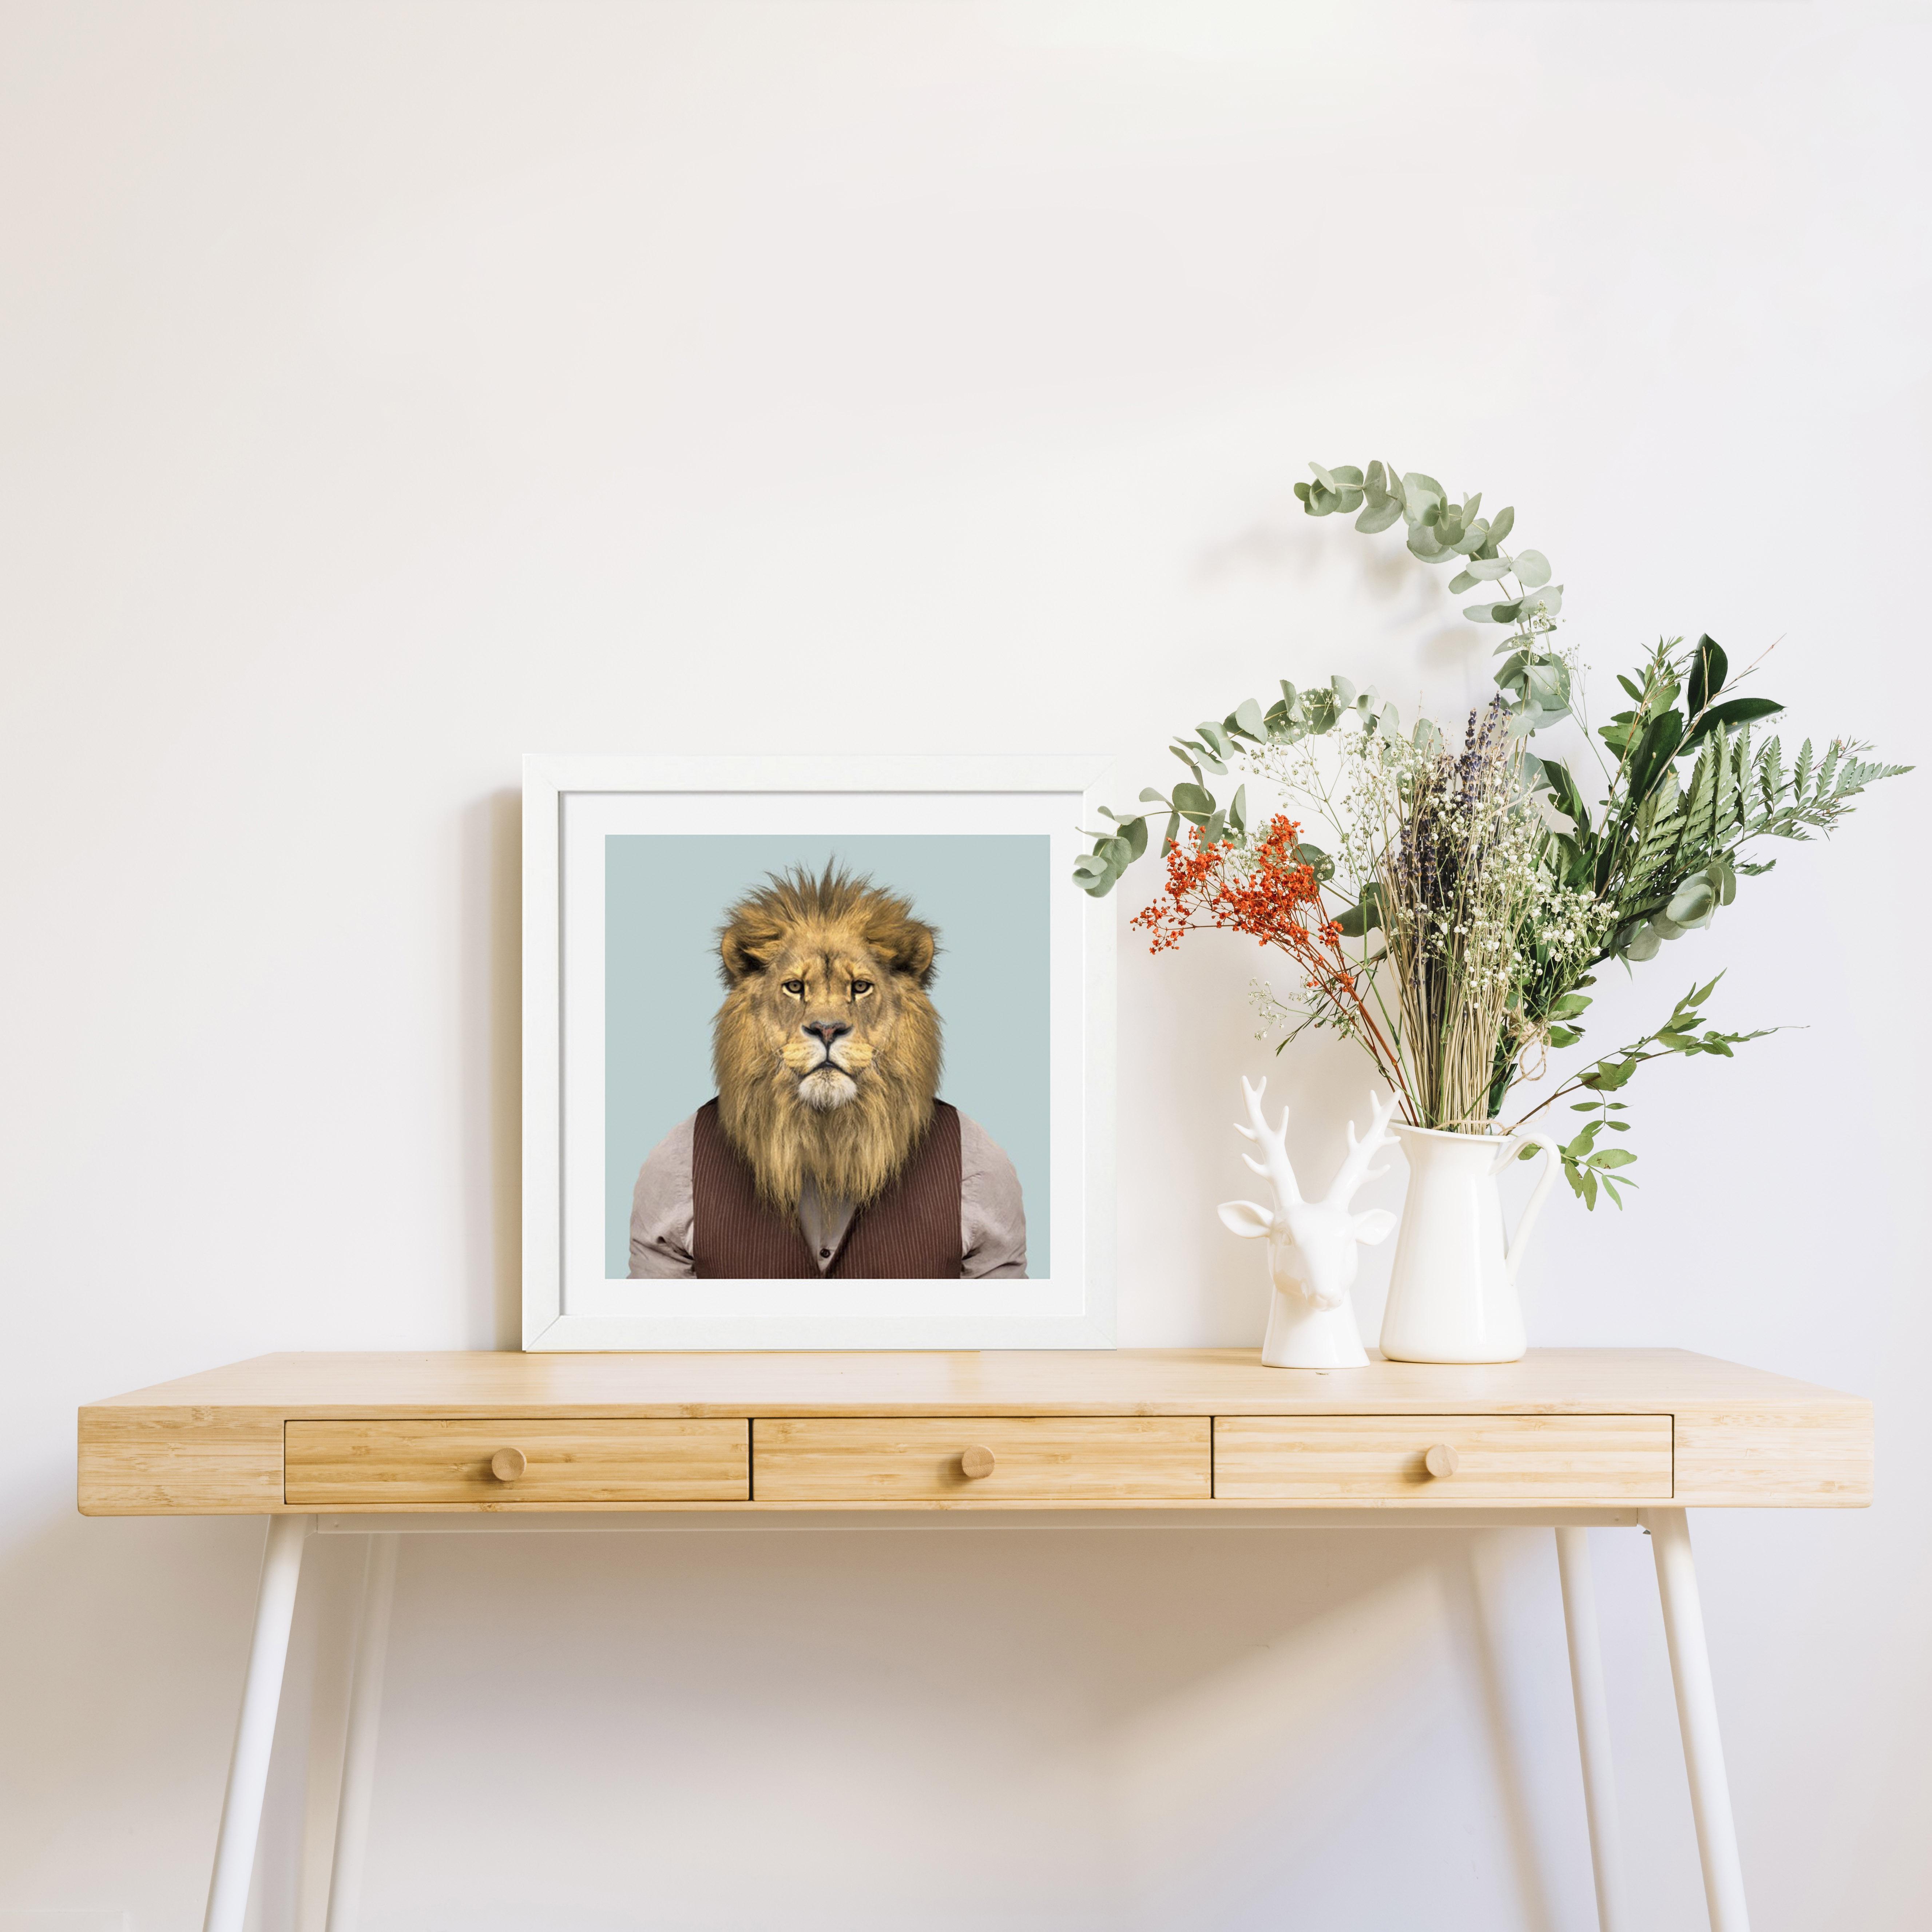 Want a Zooportrait